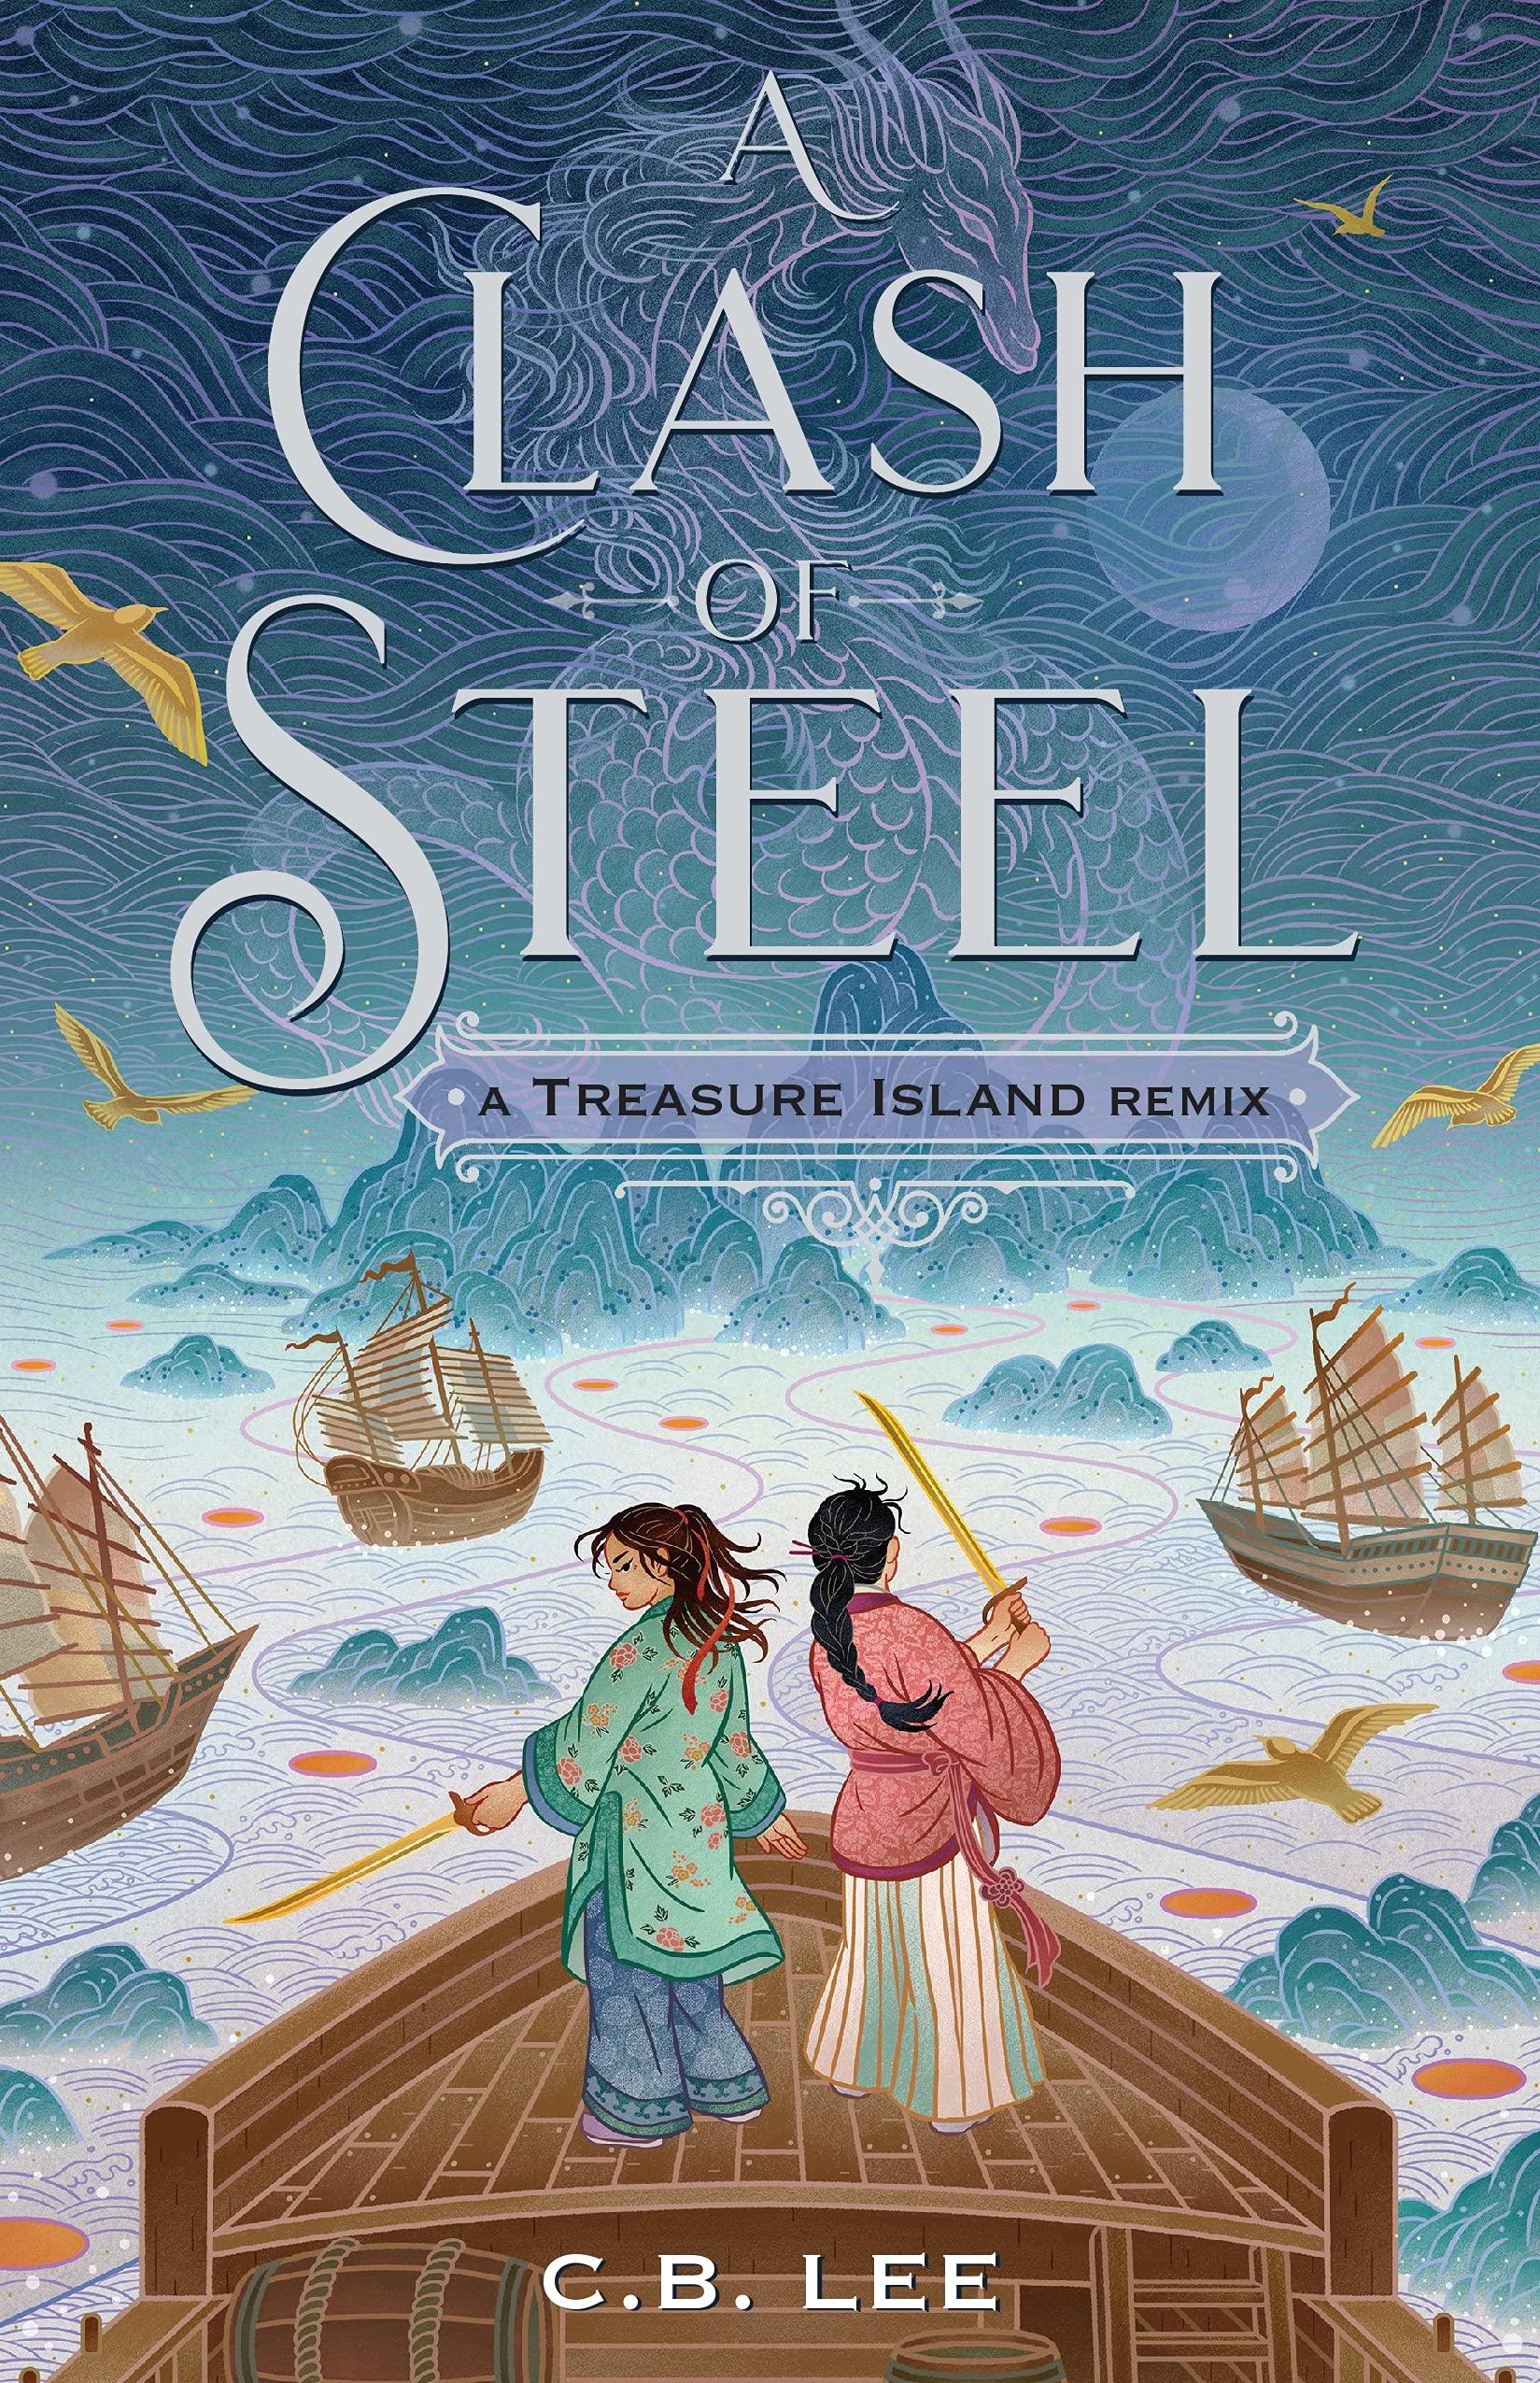 Amazon.com: A Clash of Steel: A Treasure Island Remix (Remixed Classics,  1): 9781250750372: Lee, C.B.: Books